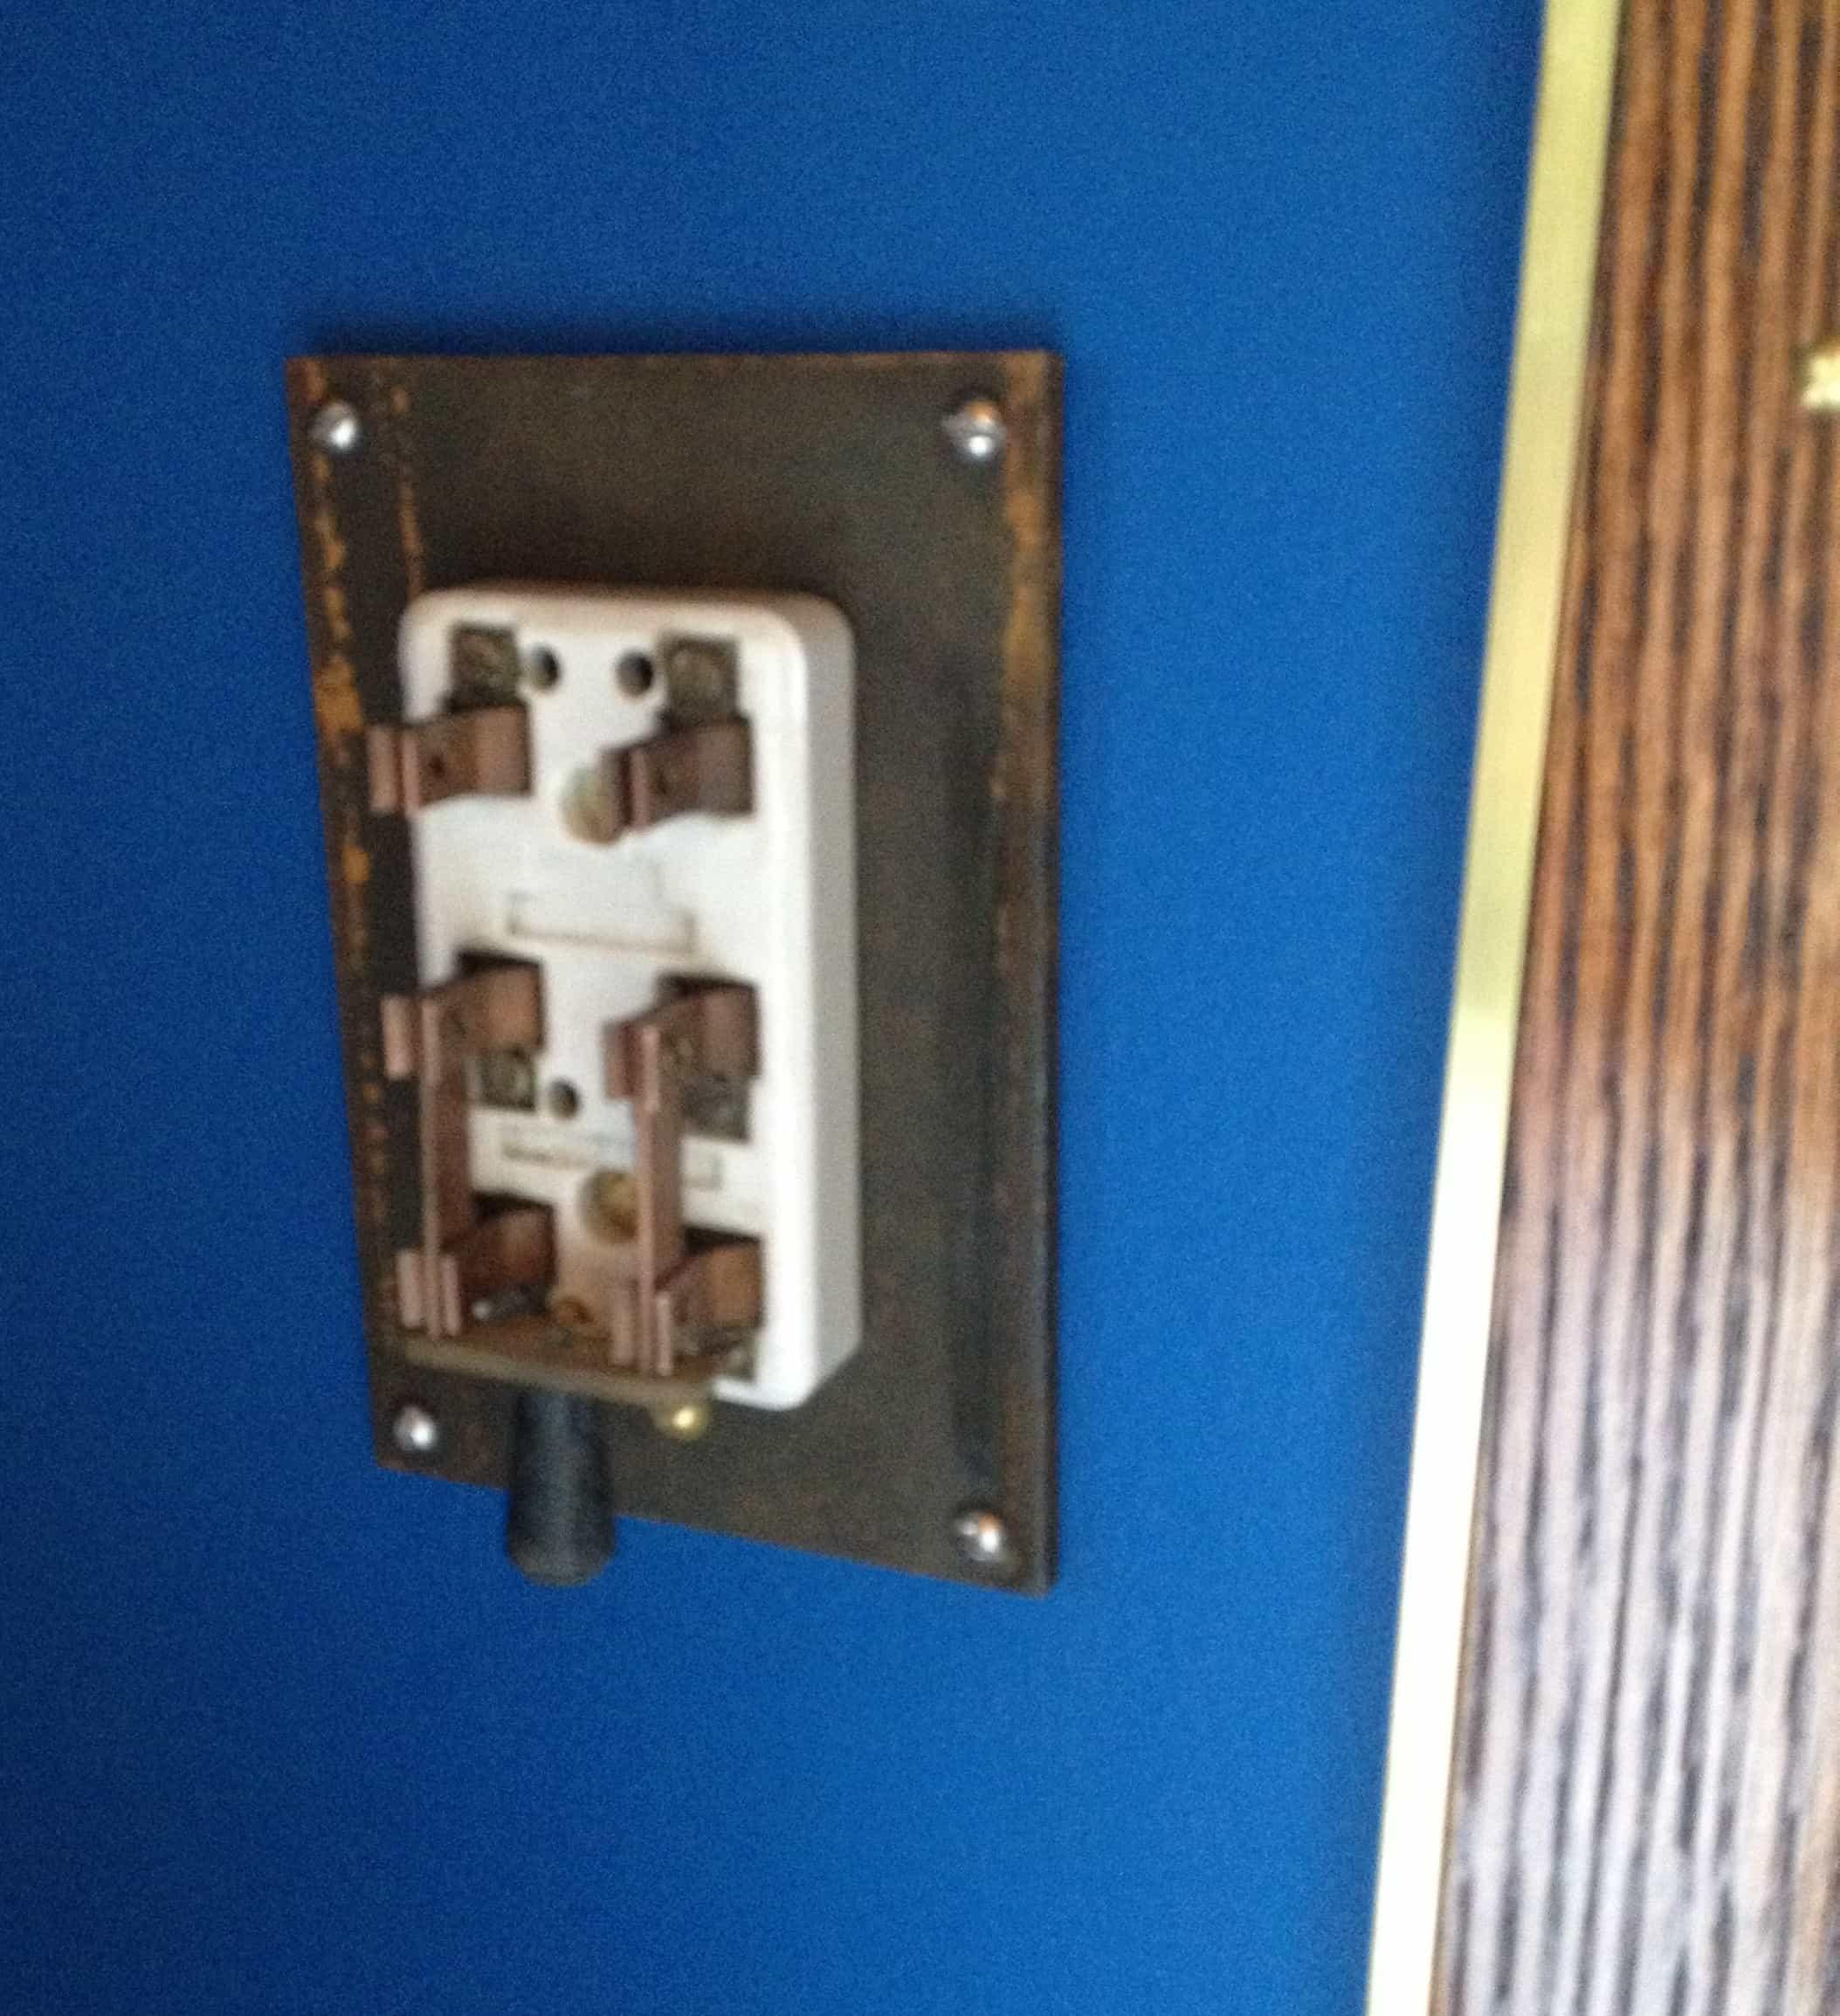 21 Teslapunk Switch on wall closed